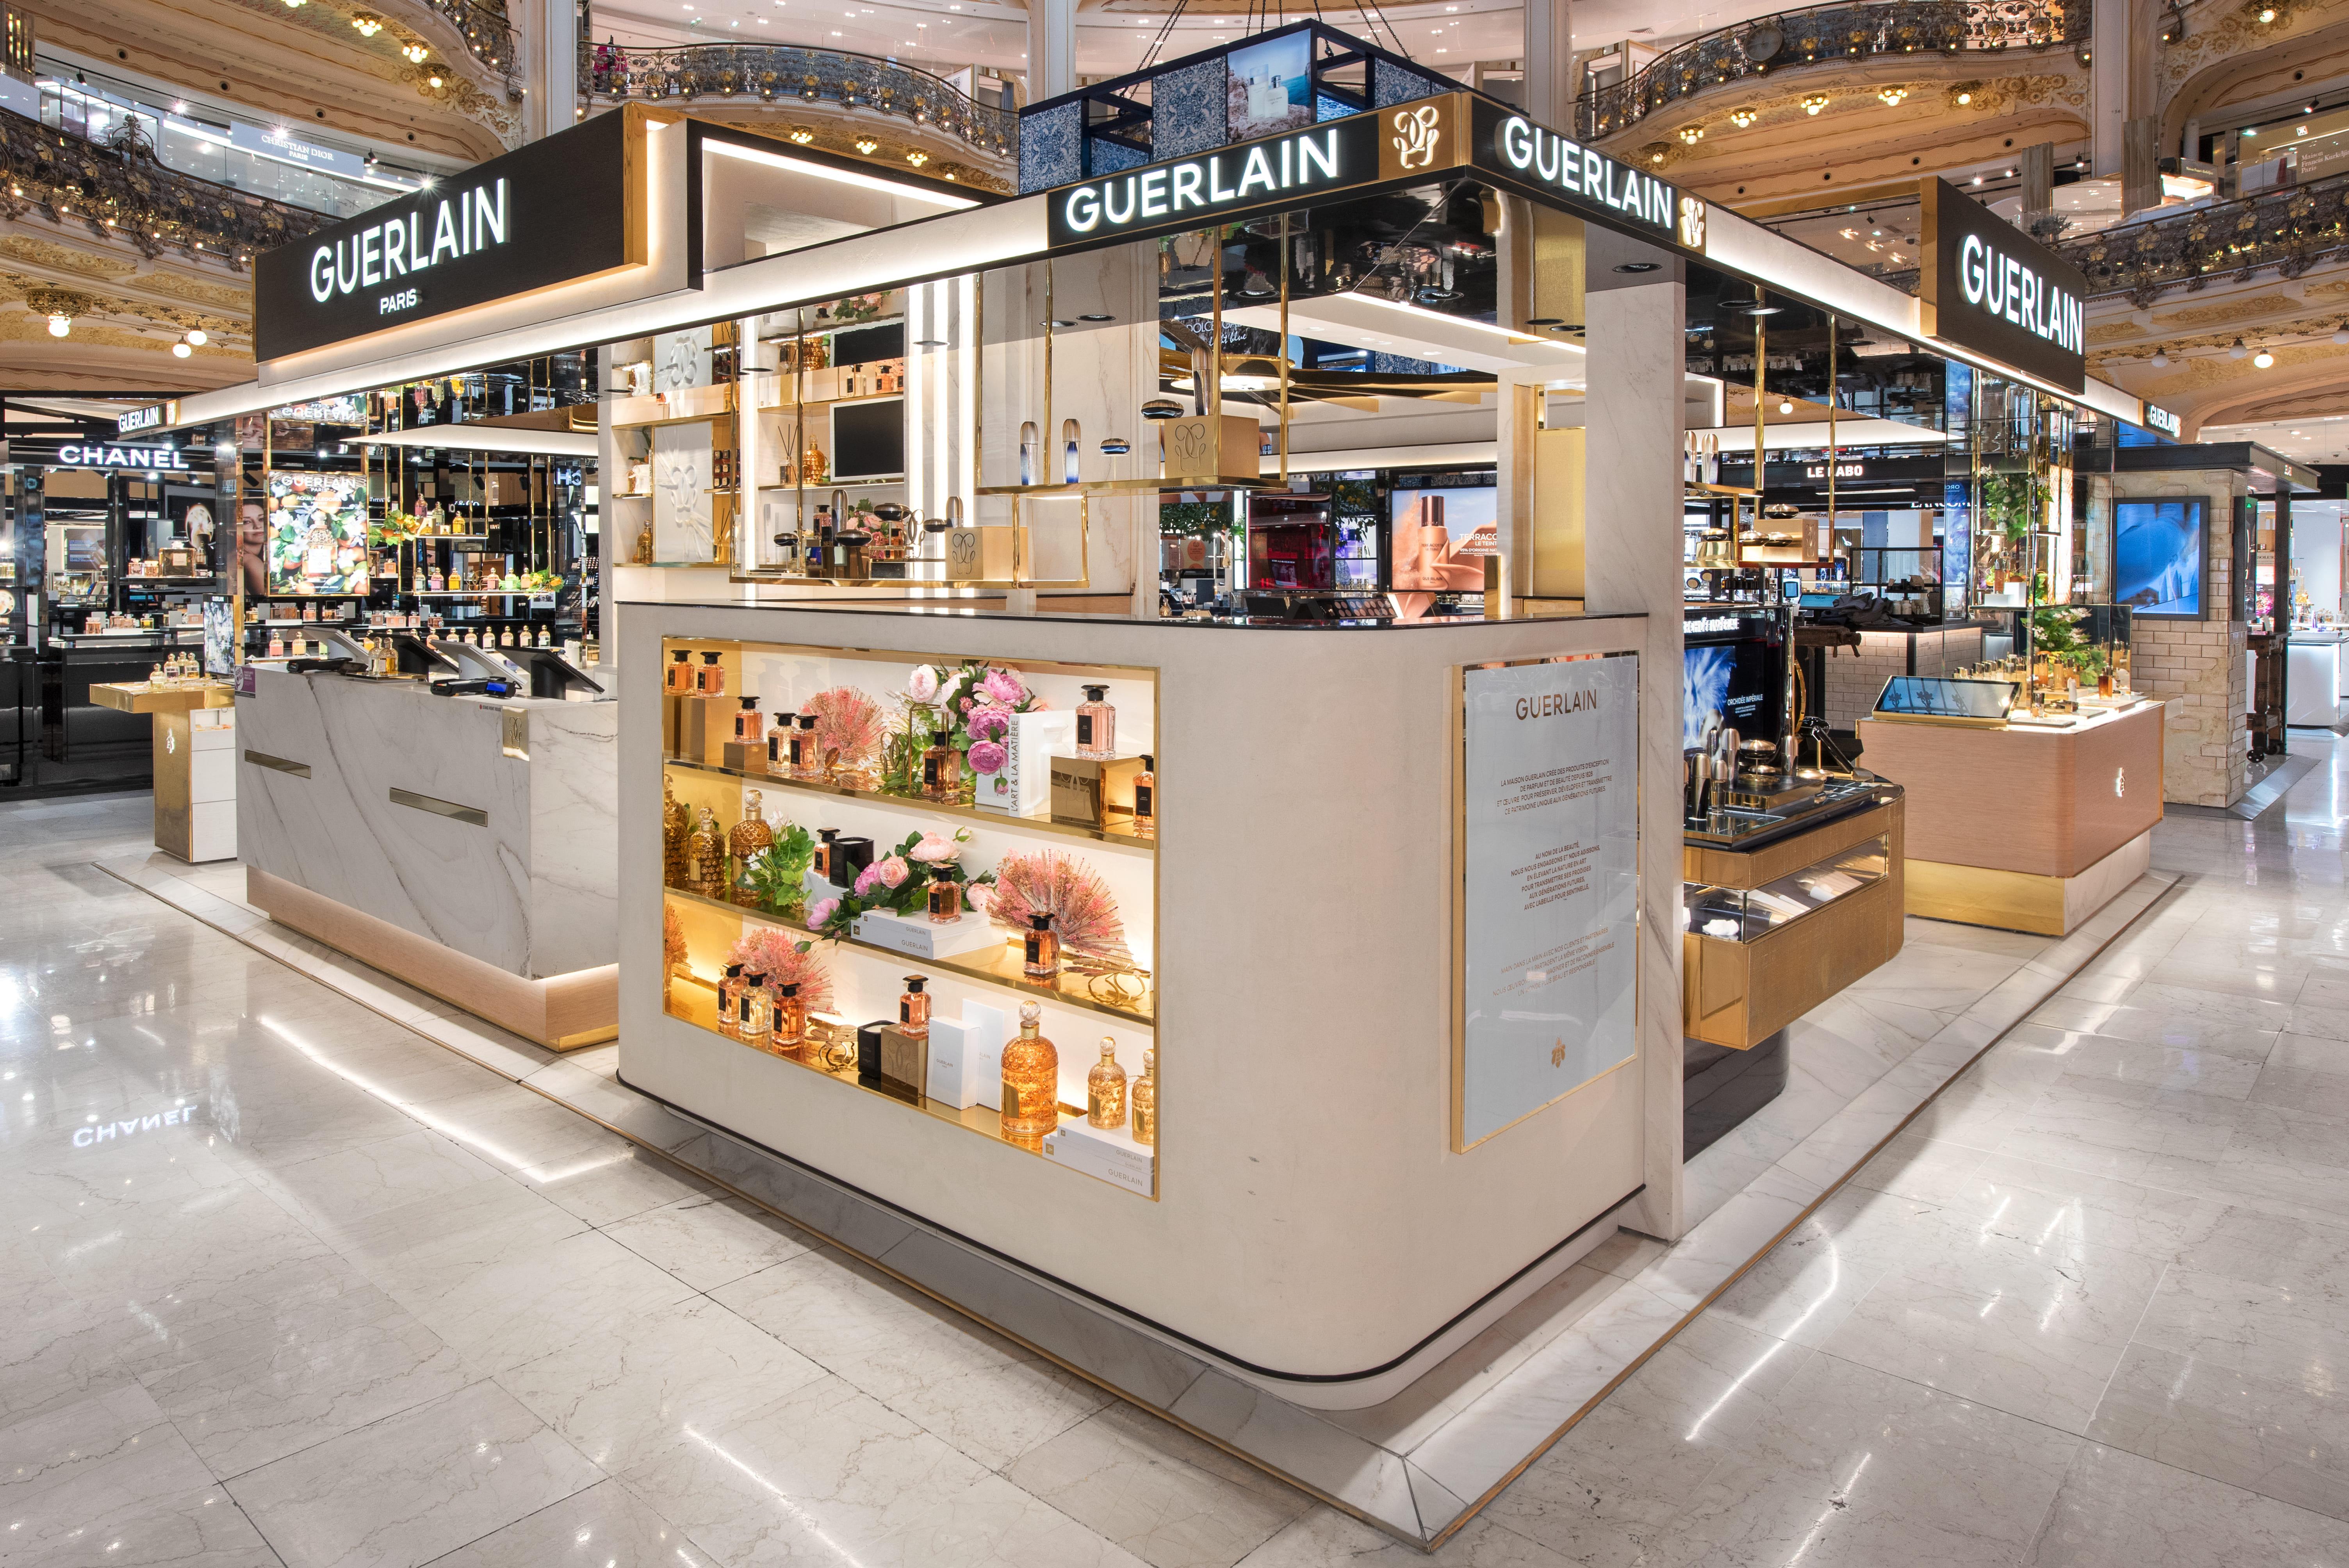 Store Guerlain